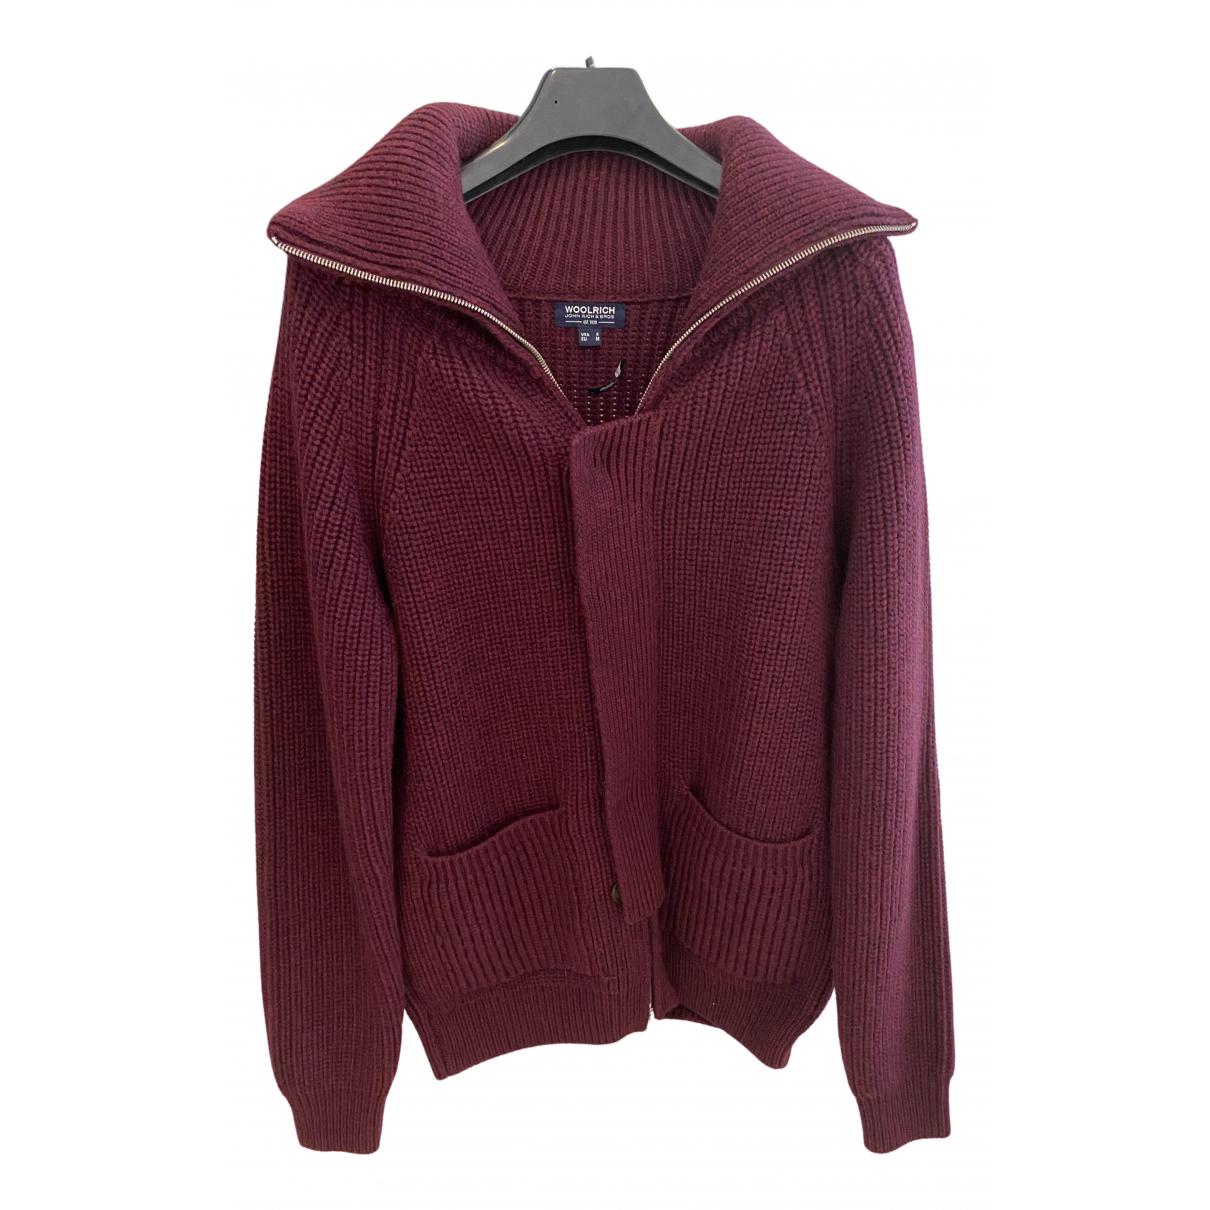 Woolrich N Burgundy Wool Knitwear & Sweatshirts for Men M International